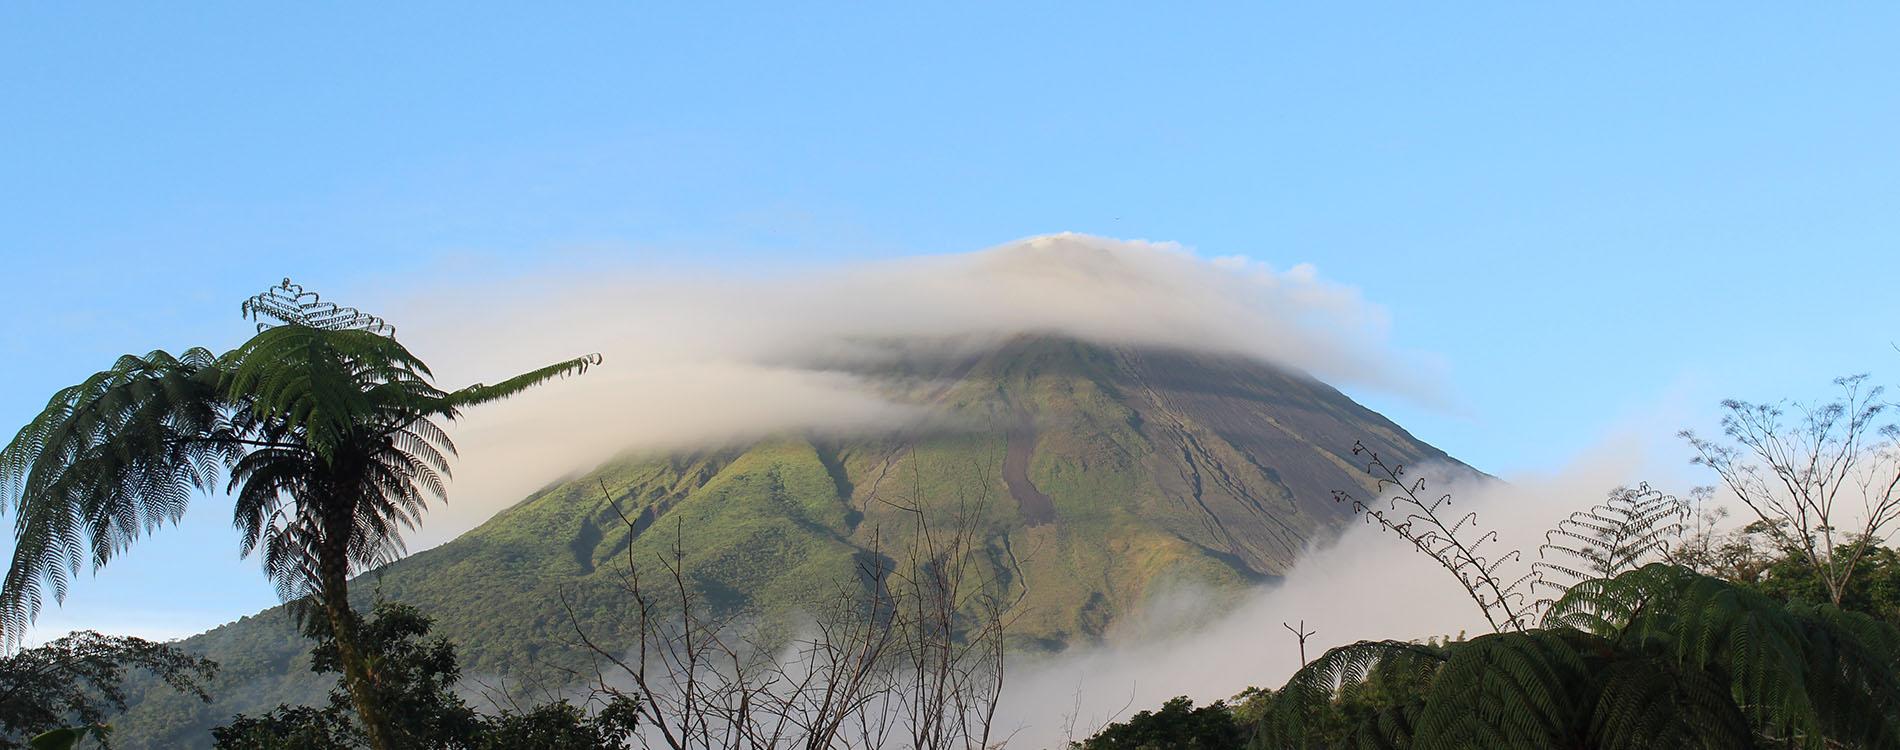 Blick auf den Vulkan Arenal www.gindeslebens.com